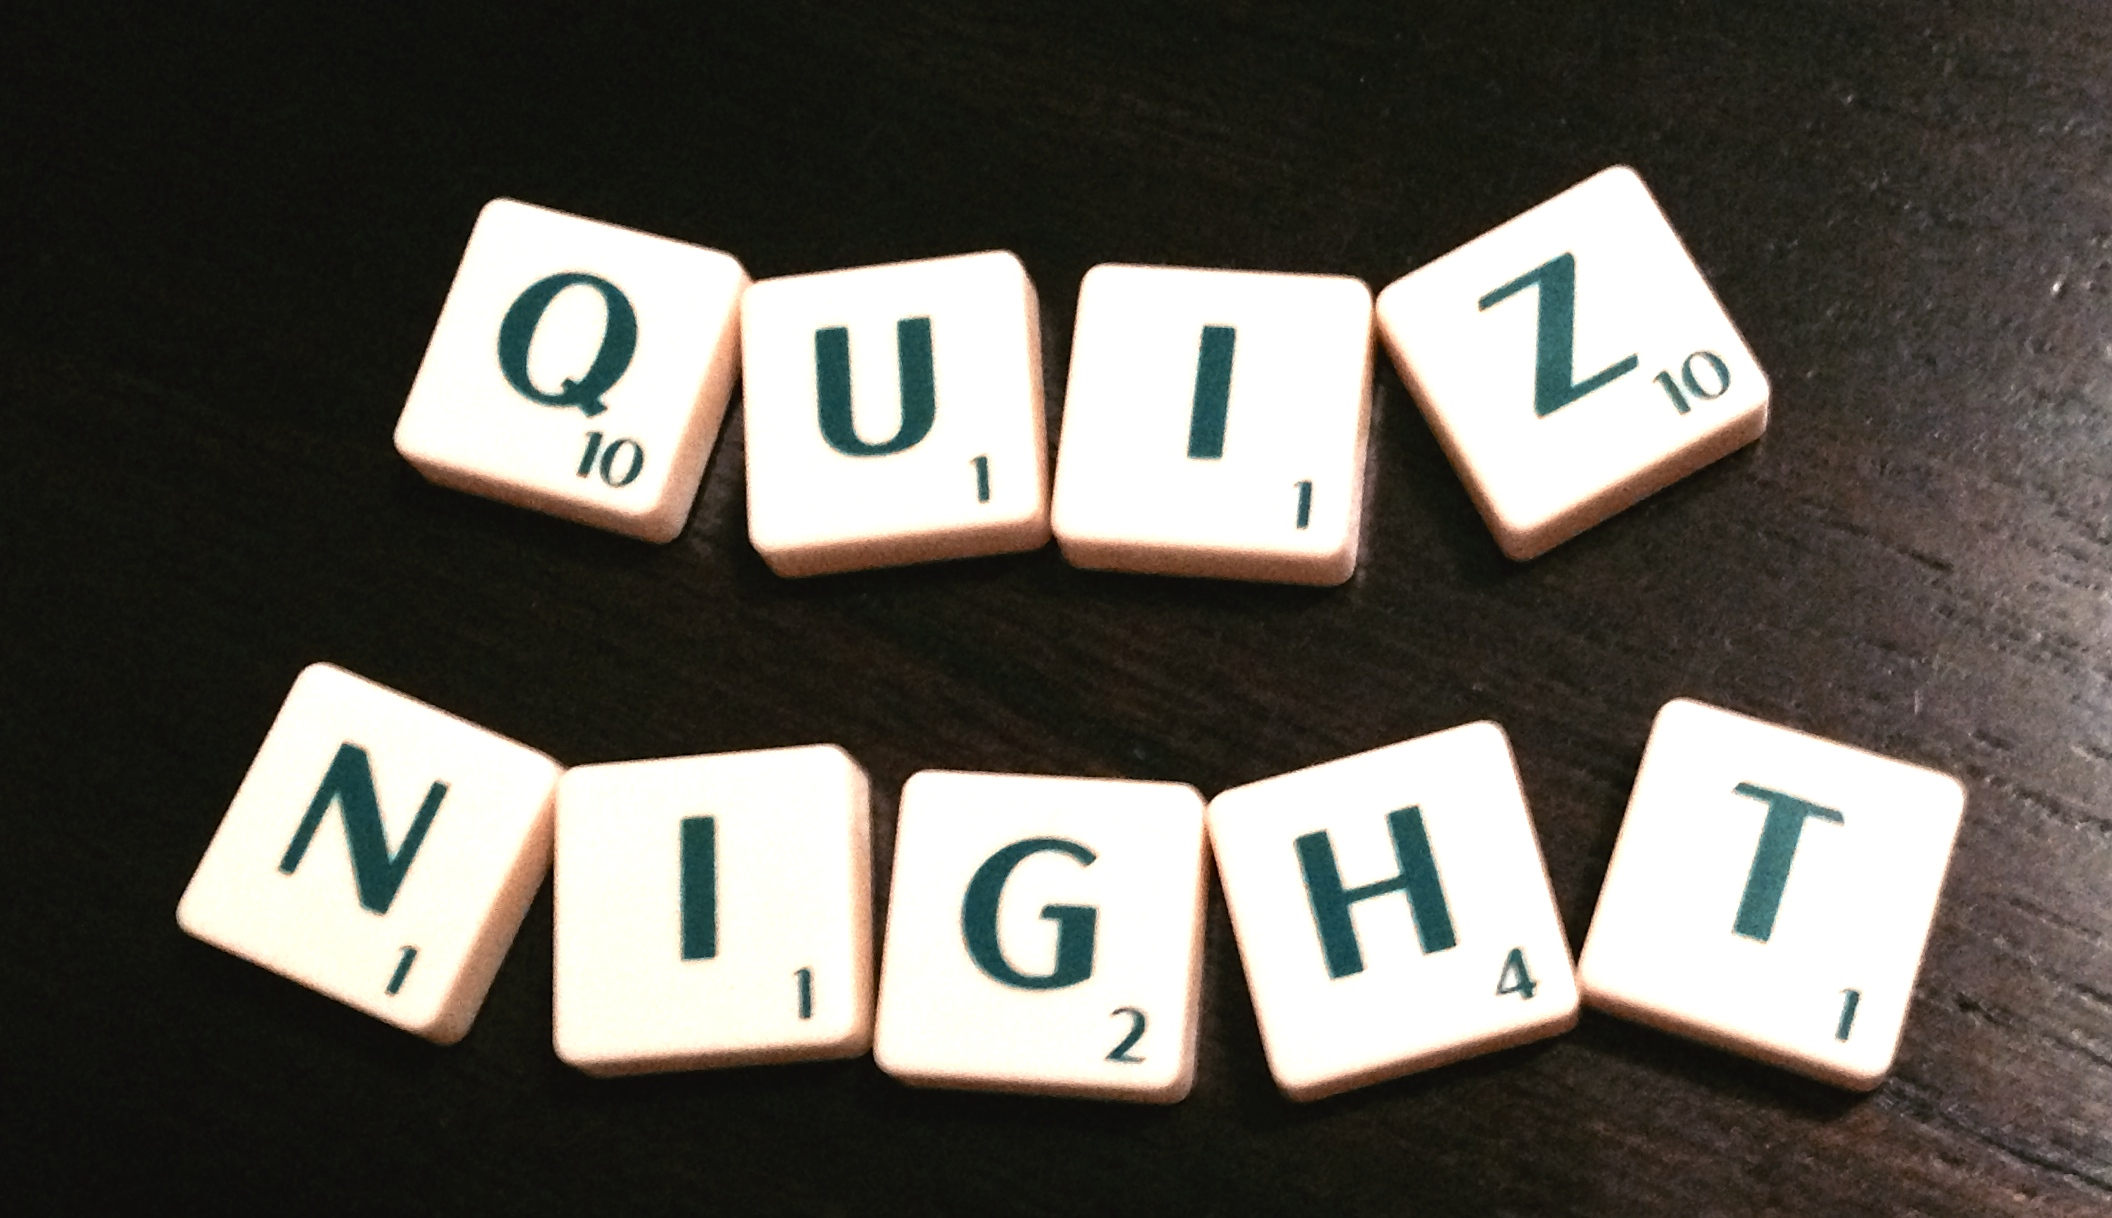 quiz night scrabble.jpg